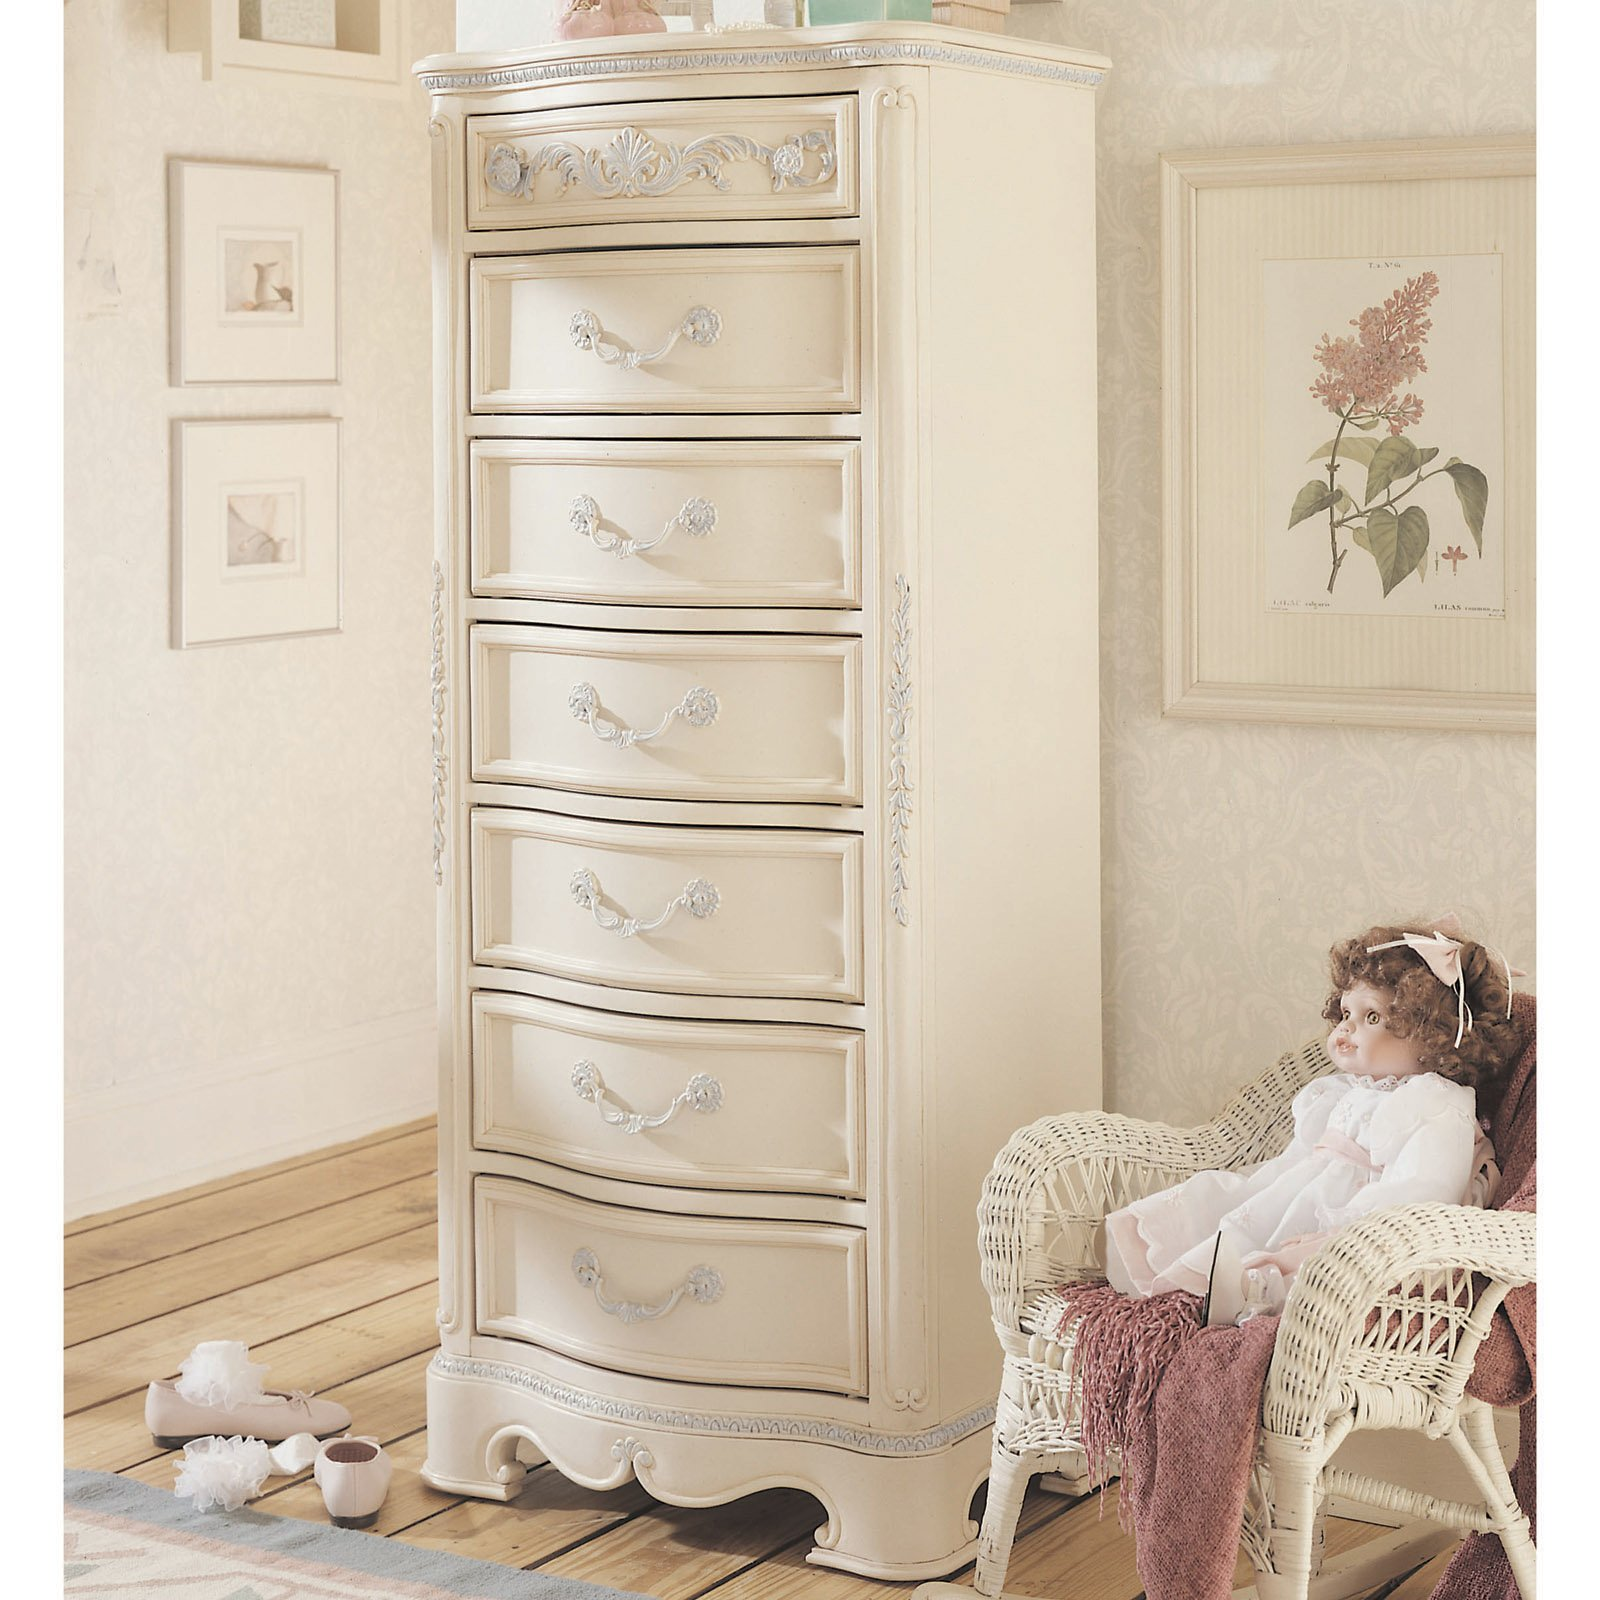 Baby cribs on craigslist - Baby Cribs On Craigslist 37